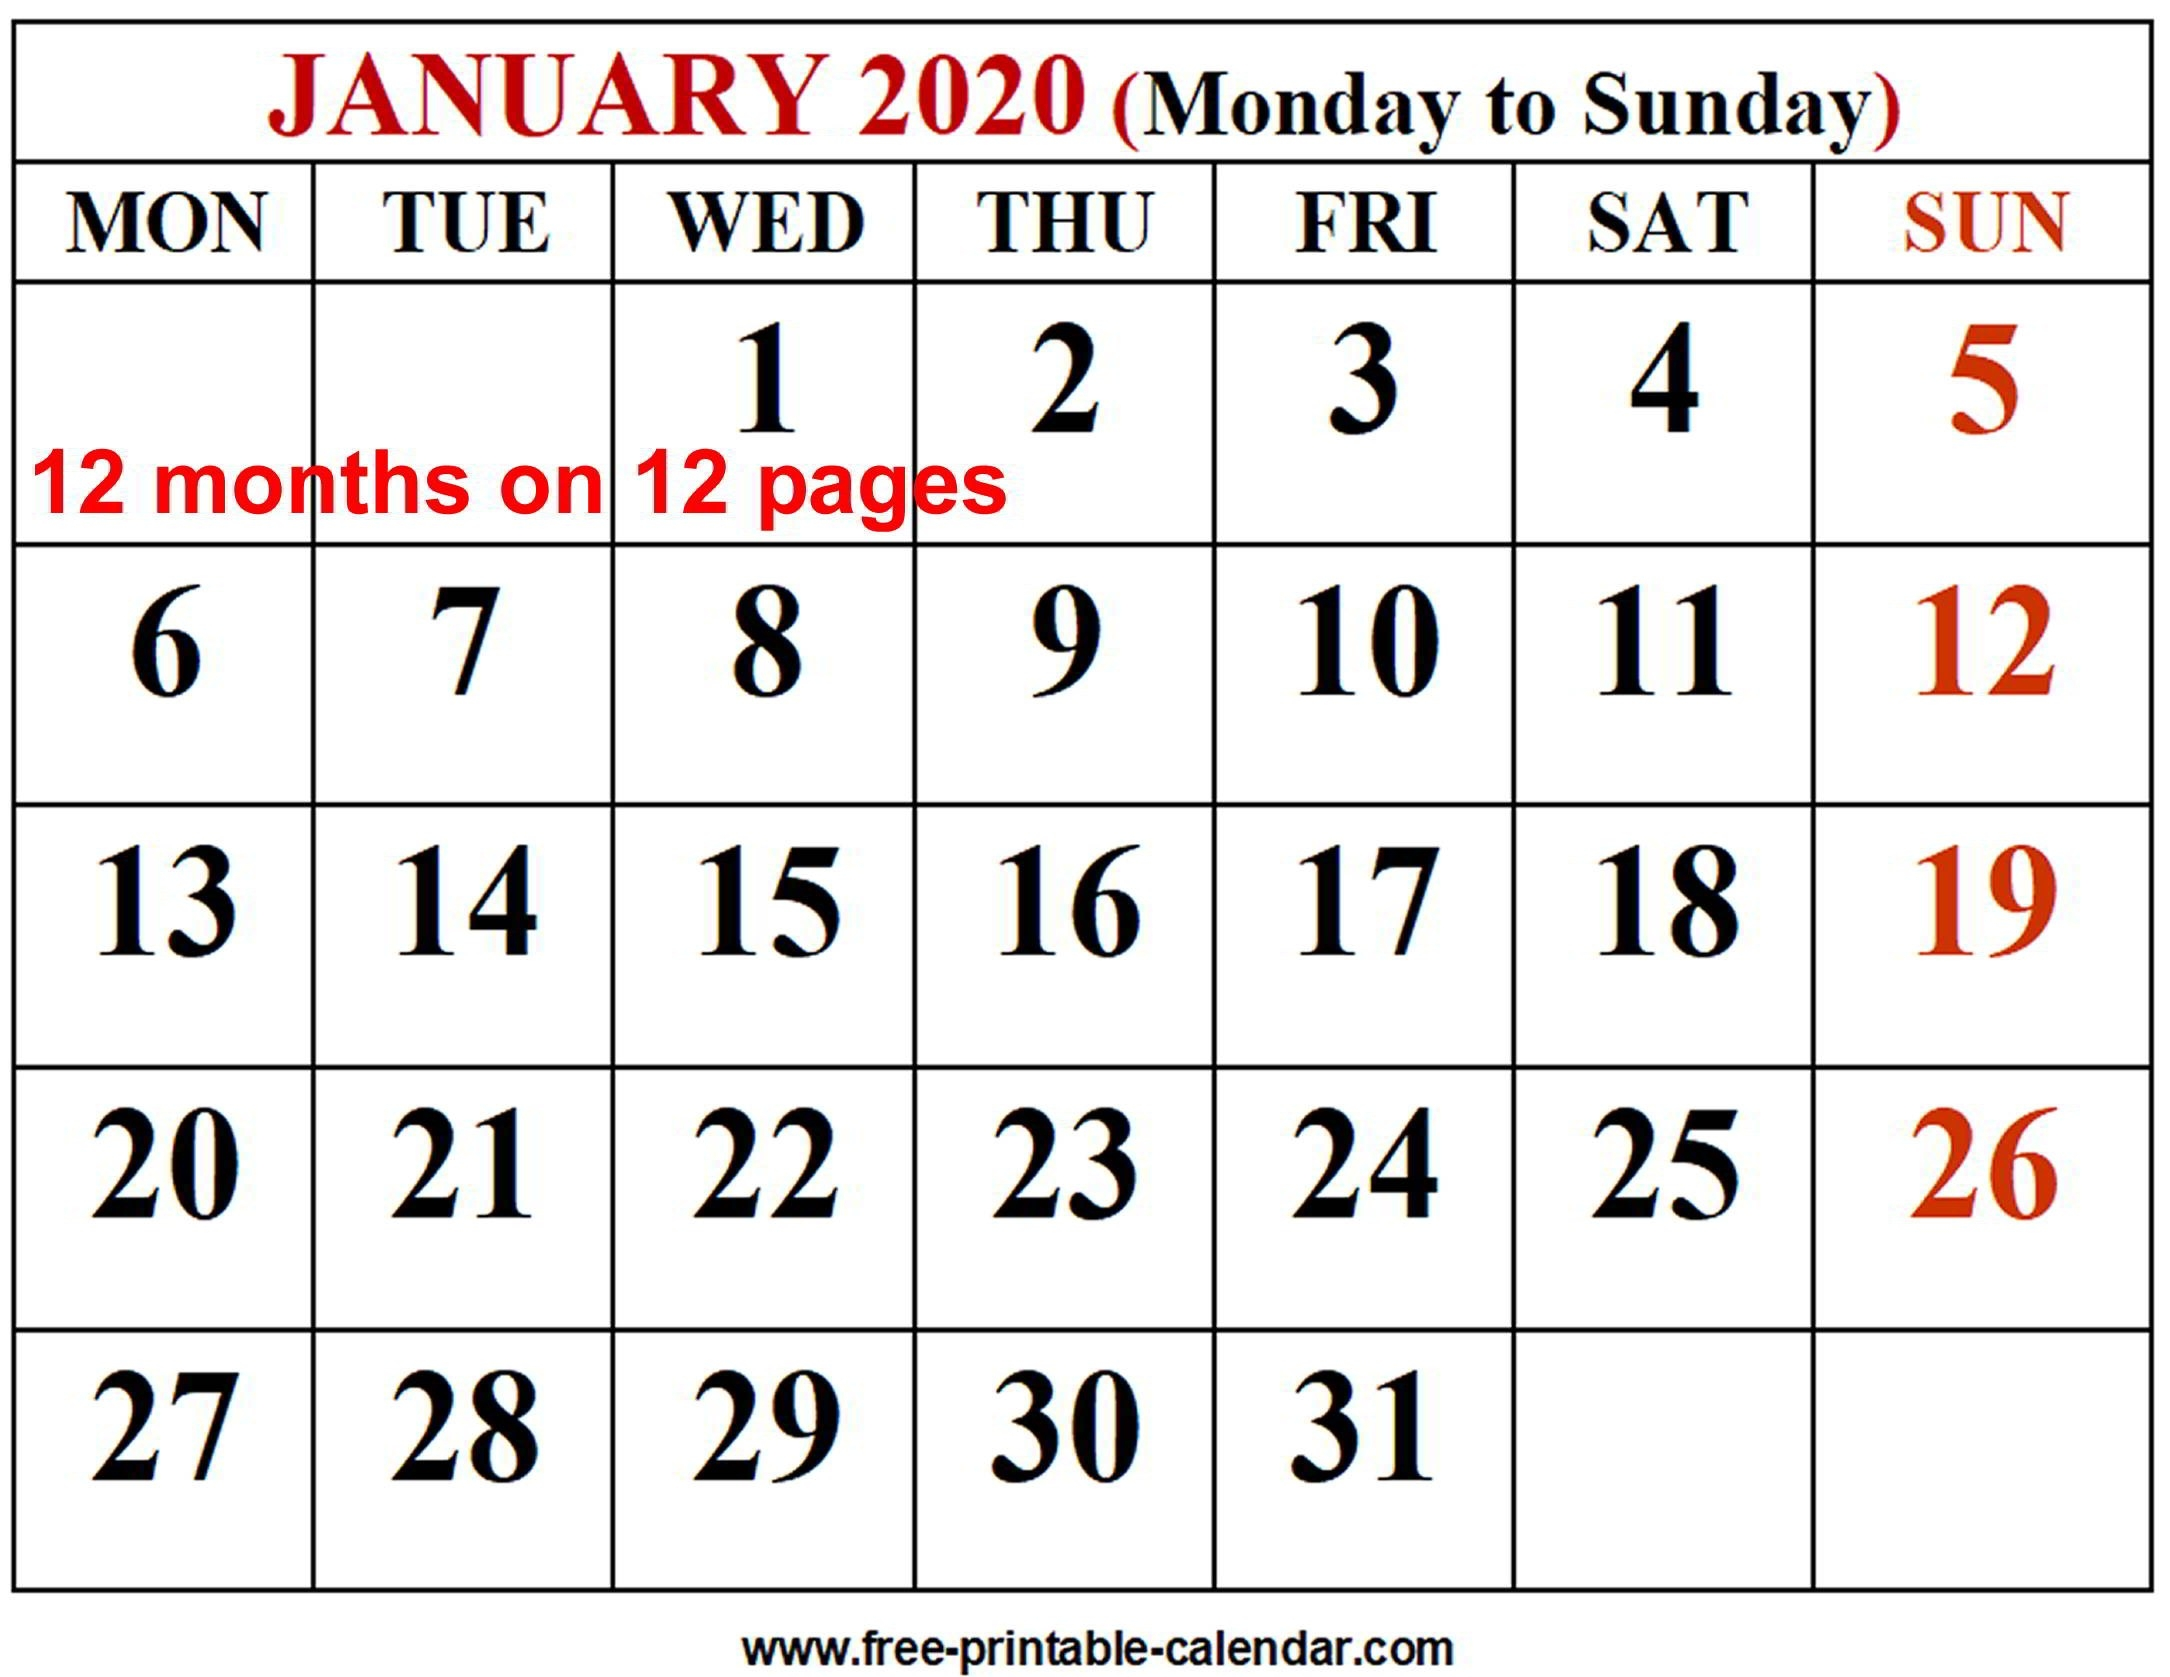 2020 Calendar Template - Free-Printable-Calendar  2020 Free 12 Month Printable Monthly Calendar